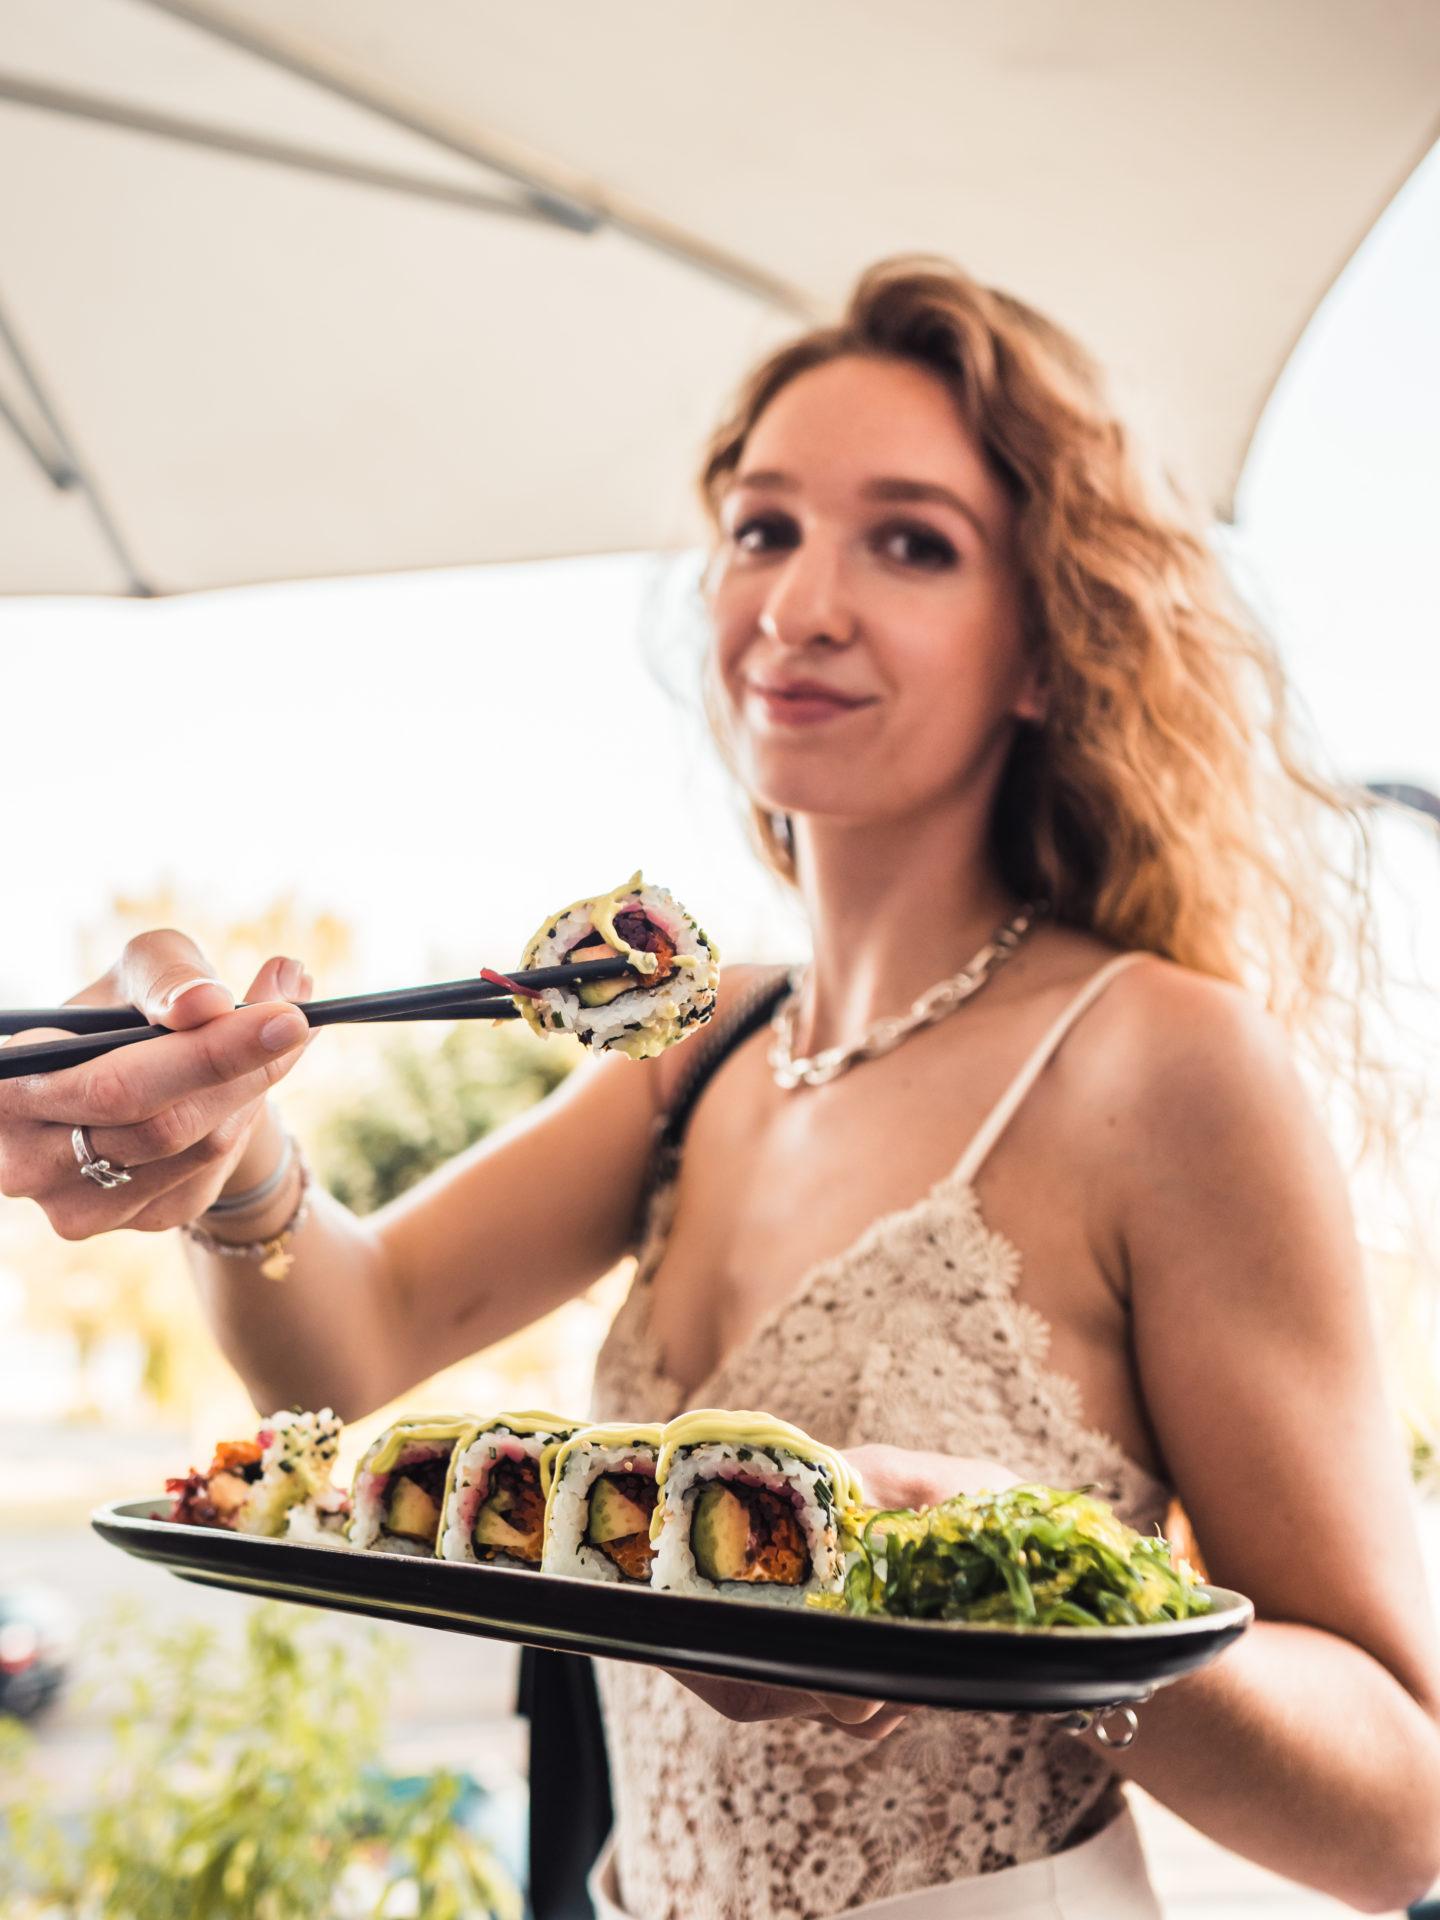 better eating habits stop nibbling